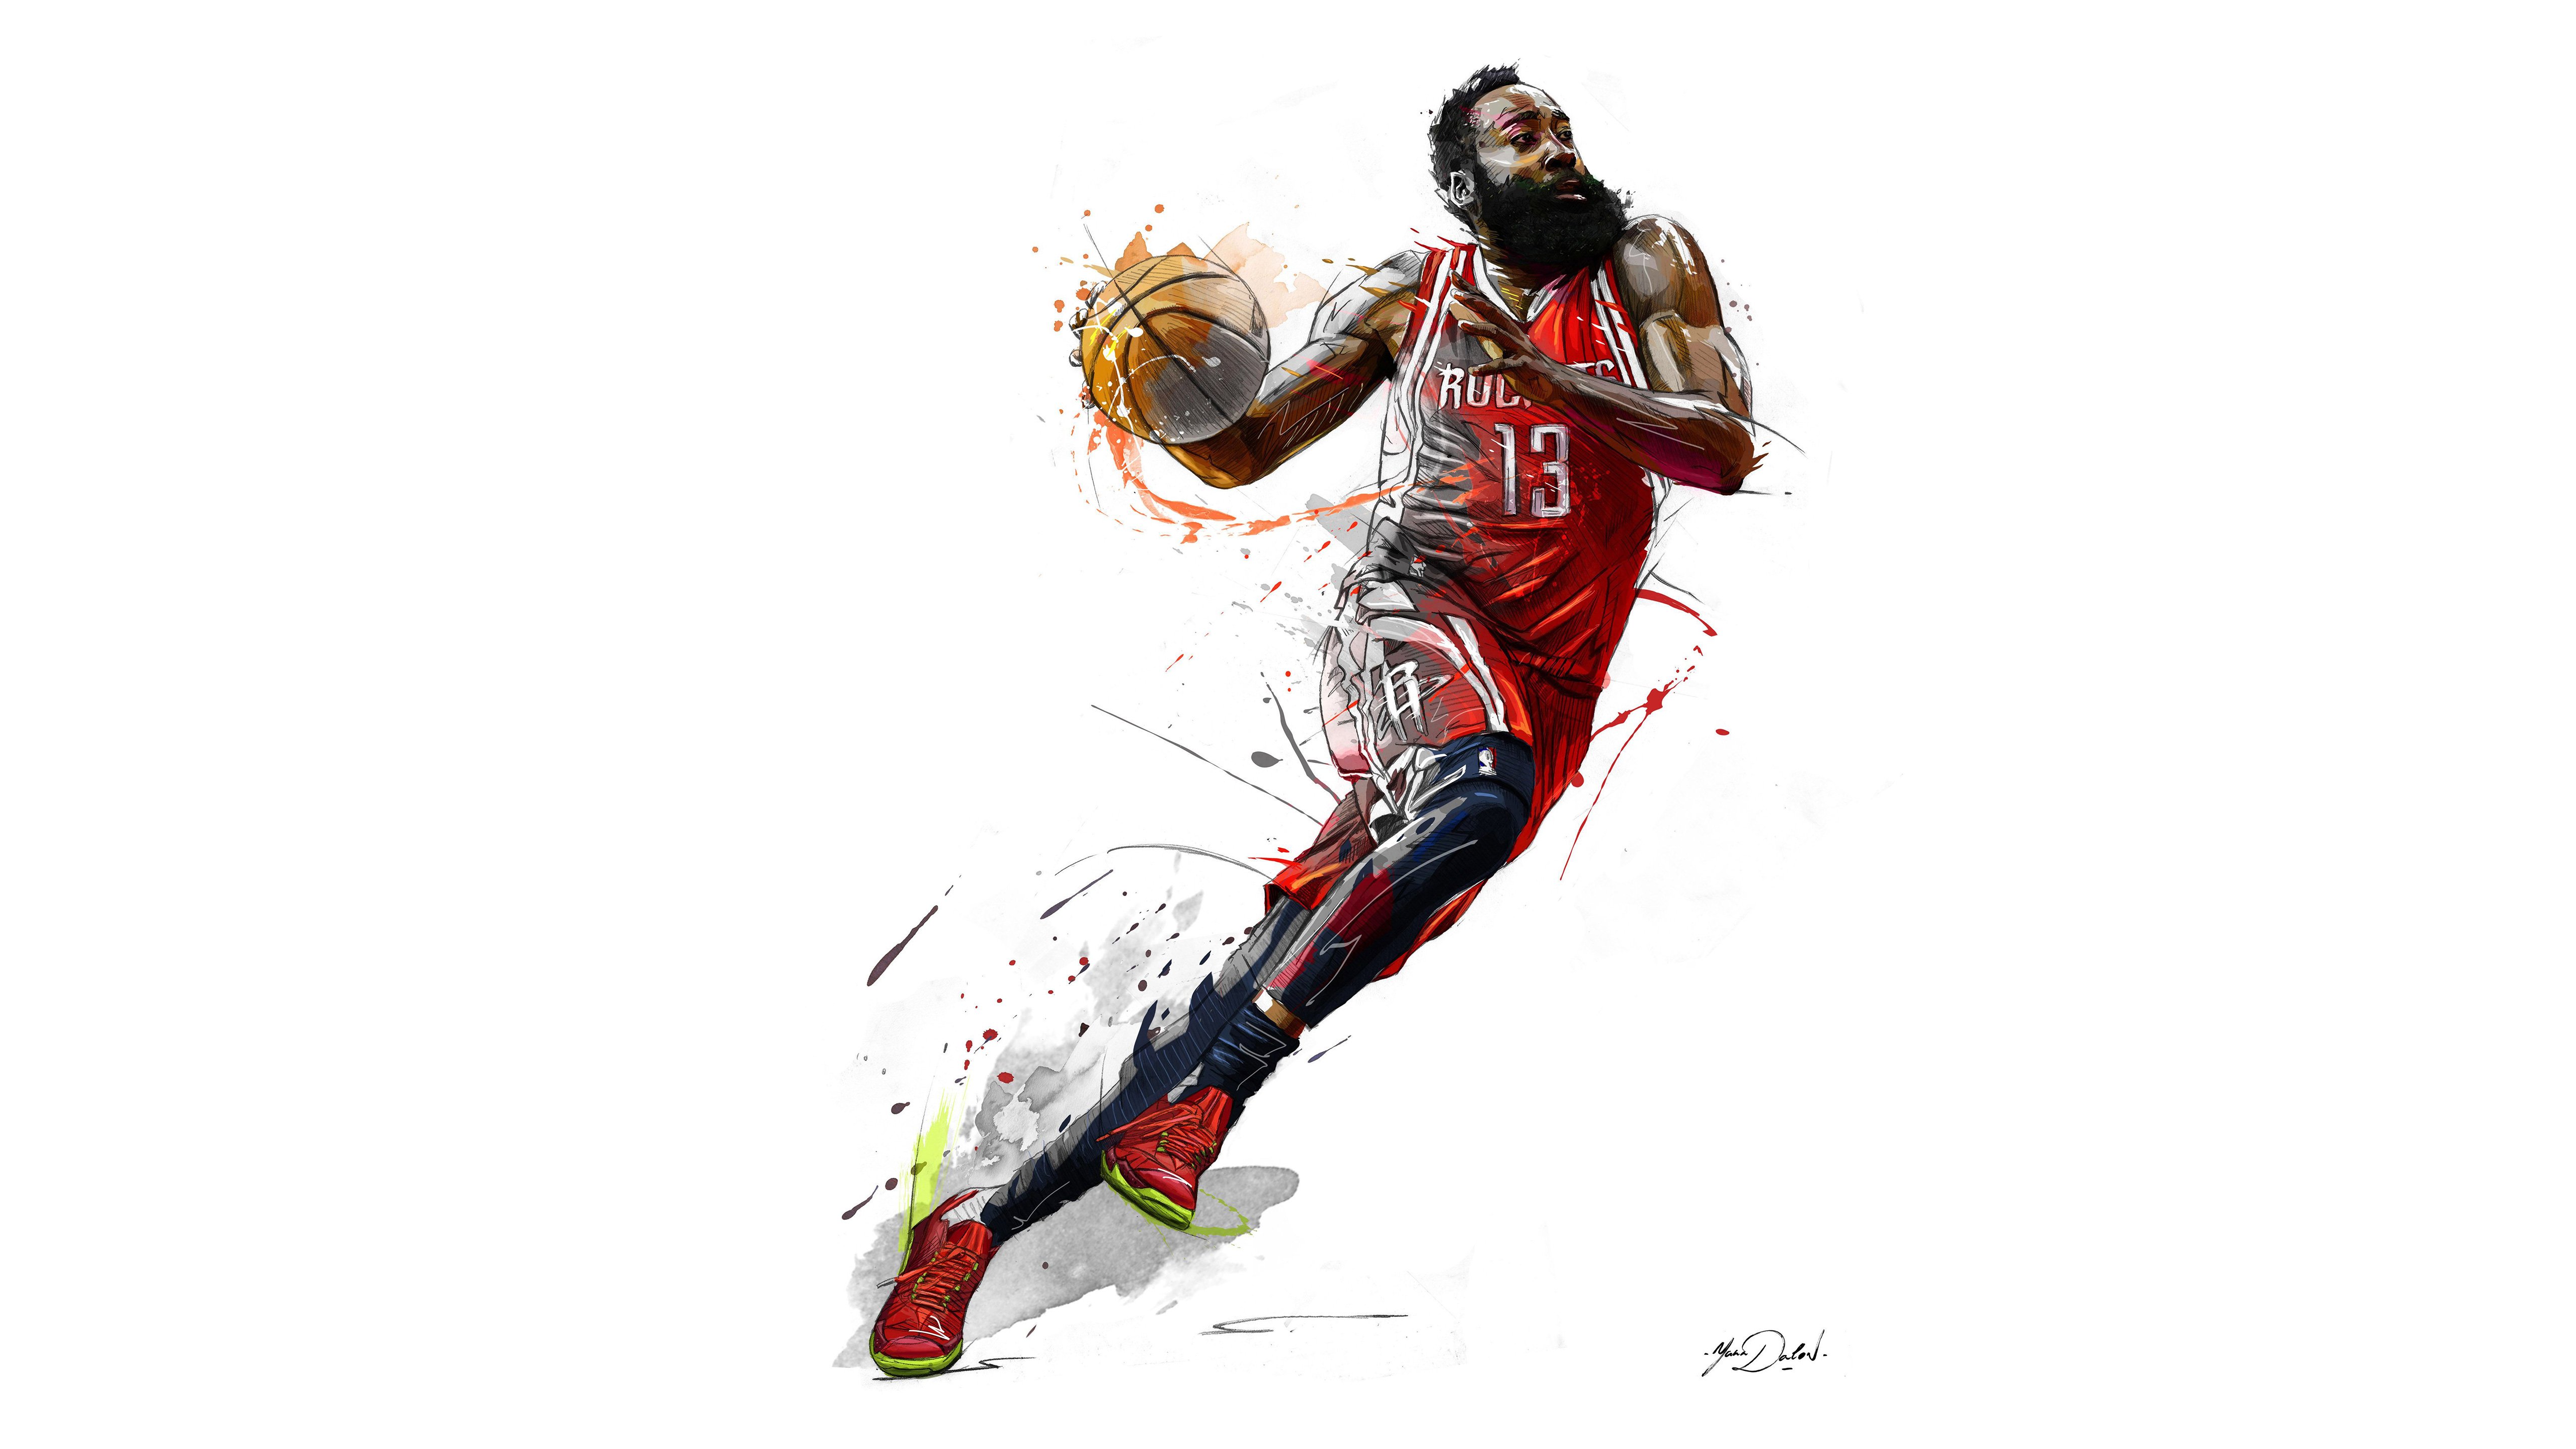 Basketball Player James Harden Wallpaper: James Harden 5k Art, HD Sports, 4k Wallpapers, Images